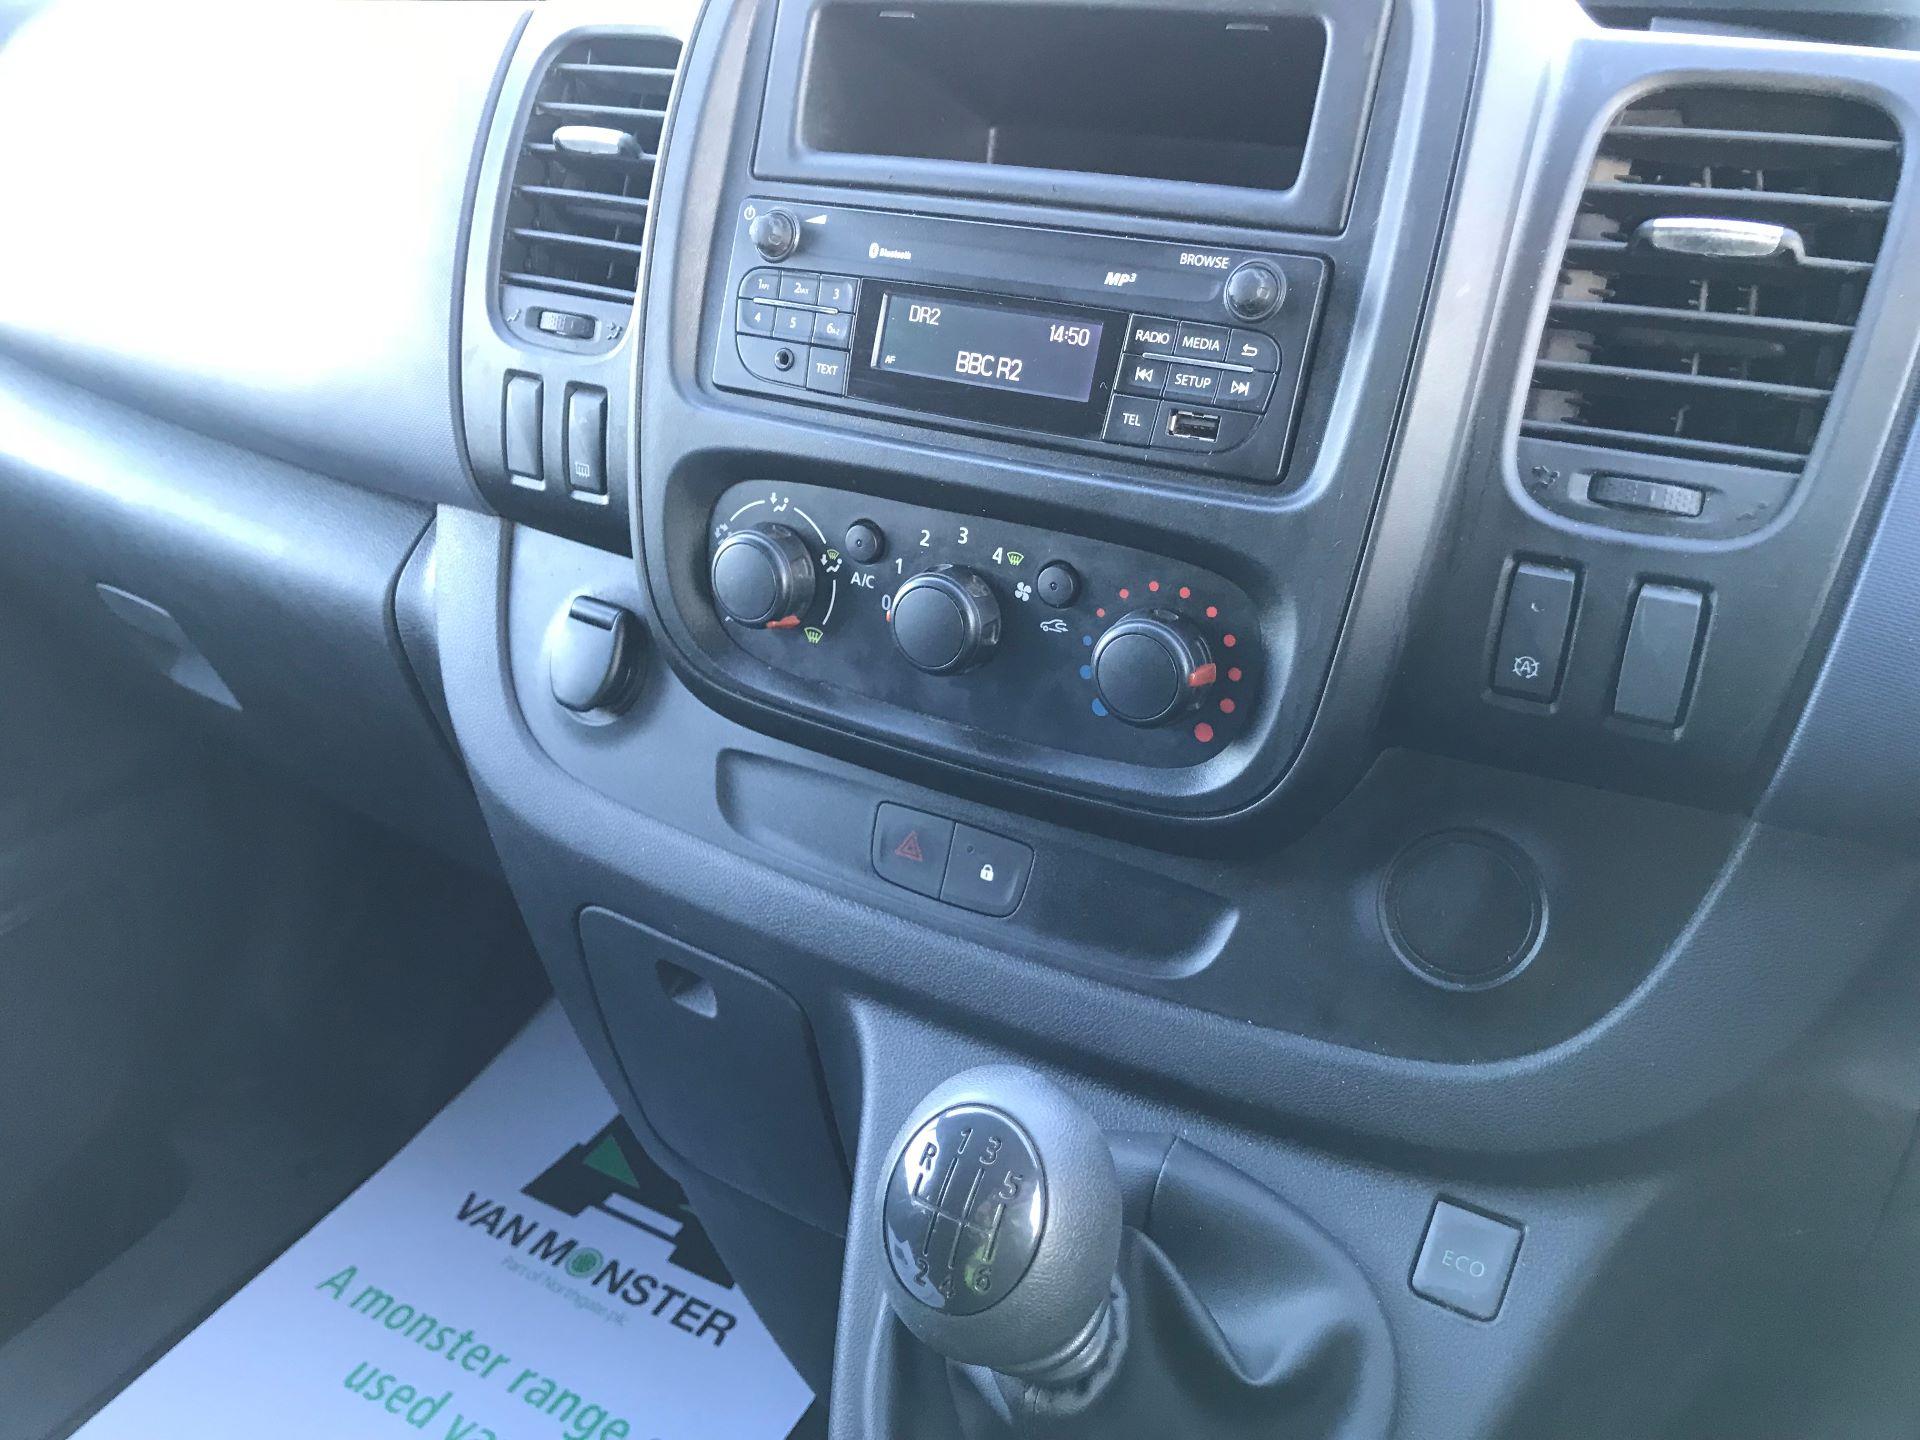 2017 Vauxhall Vivaro 2900 1.6Cdti Biturbo 125Ps H1 Combi 9 Seat (DY17UVM) Image 31